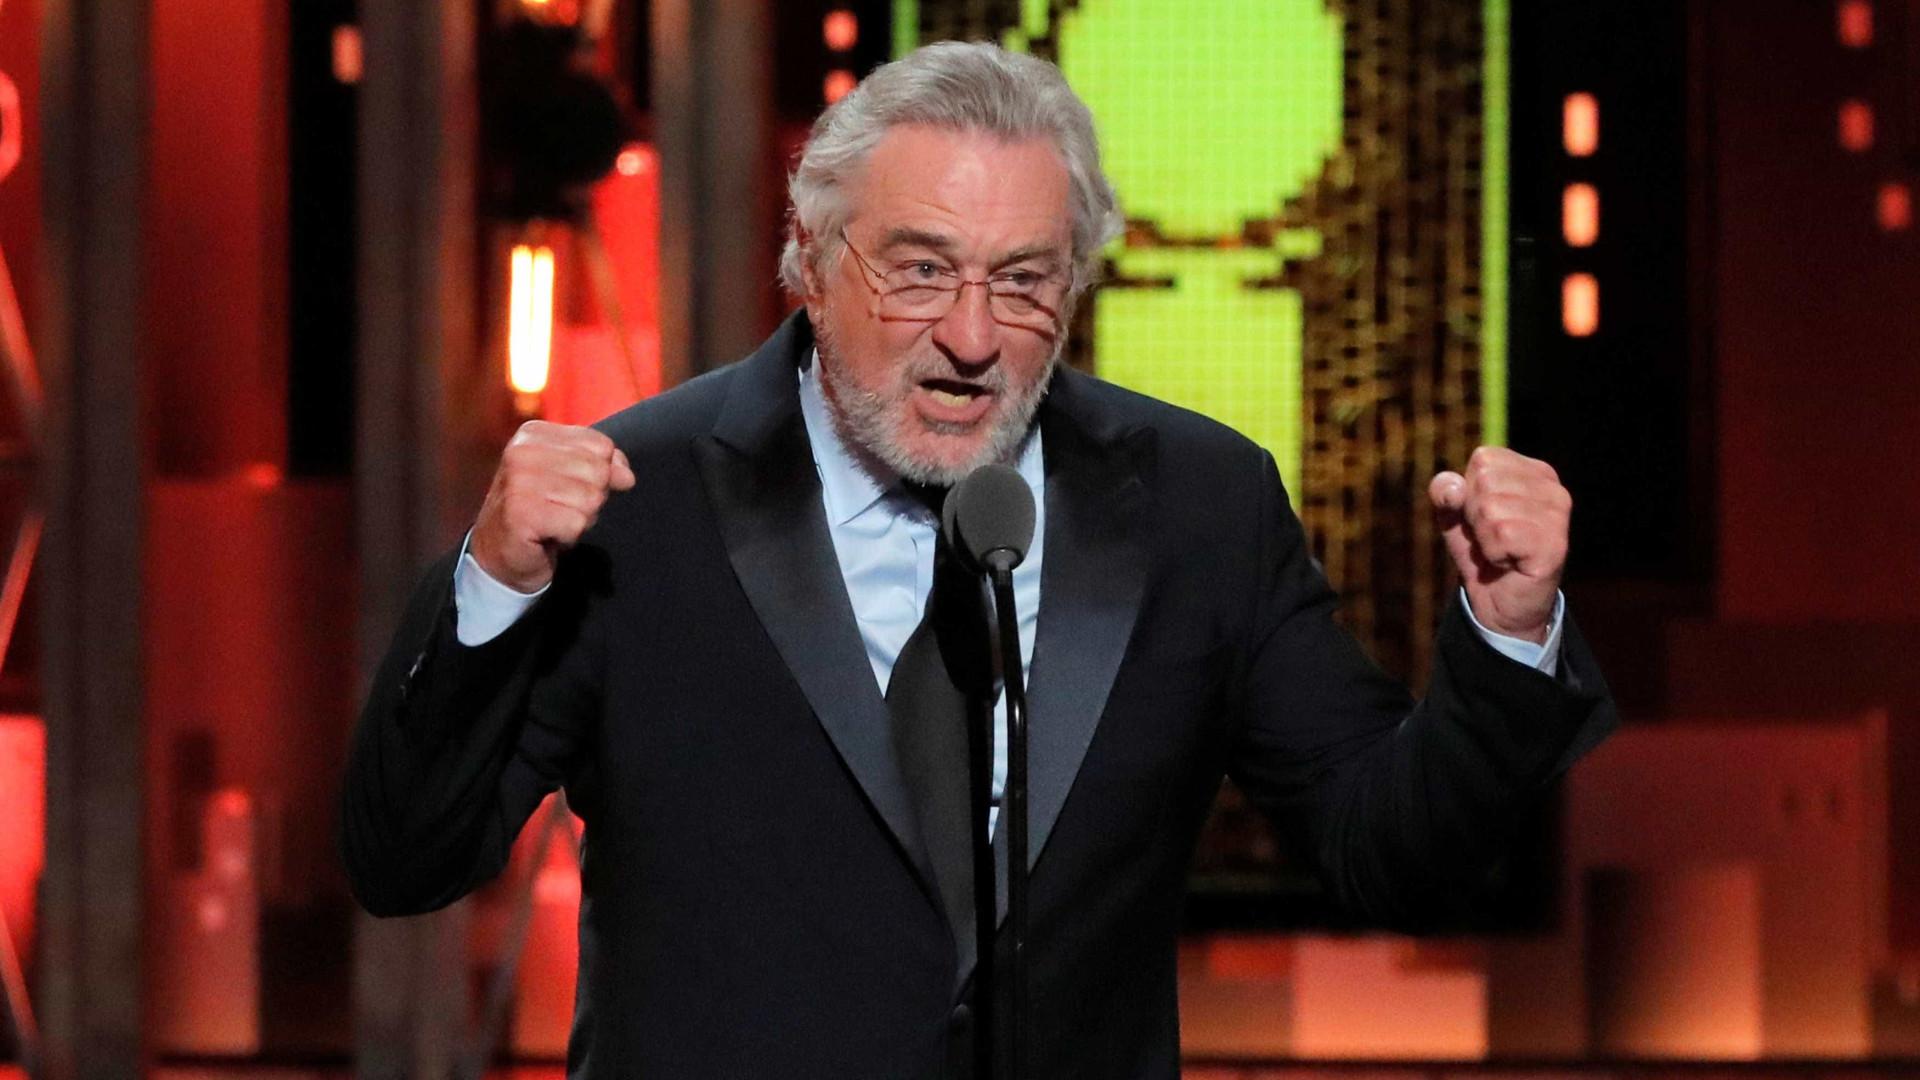 Discursos políticos marcam entrega do Tony Awards